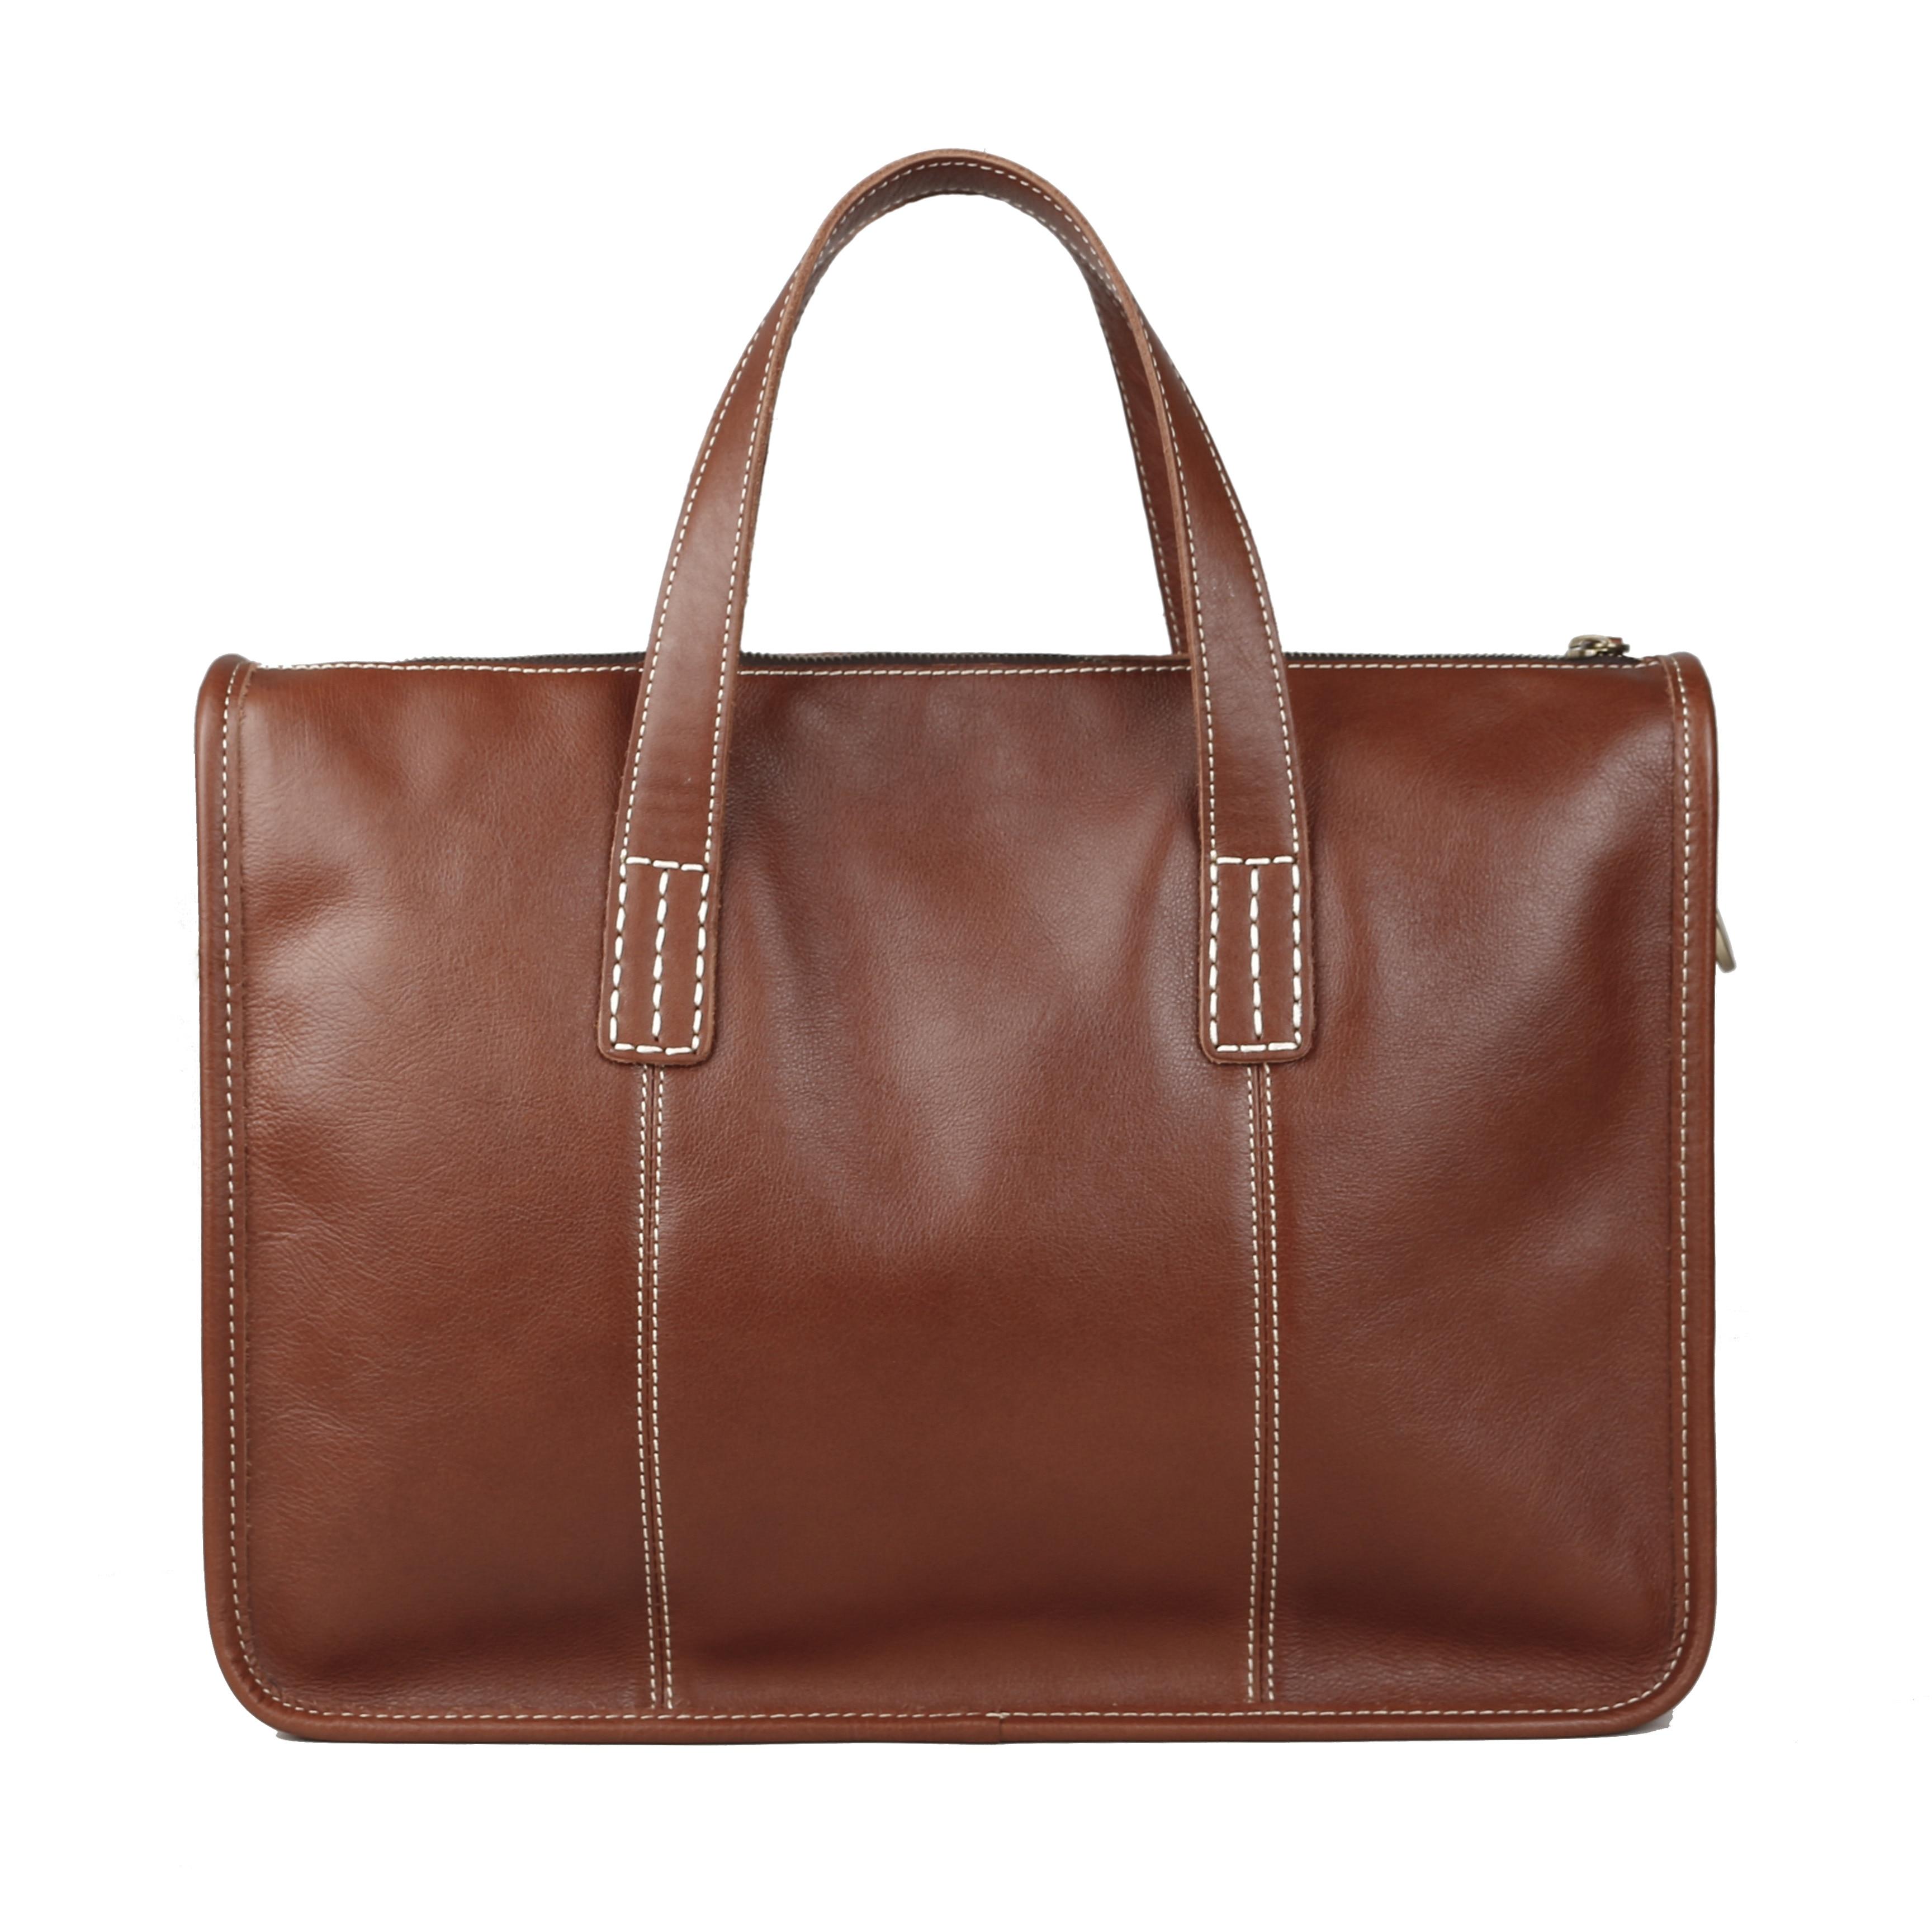 Casual masculino bolsa de couro genuíno vintage mensageiro bolsa de ombro maleta de couro sacos para homem 13.3 Polegada portátil nupugoo